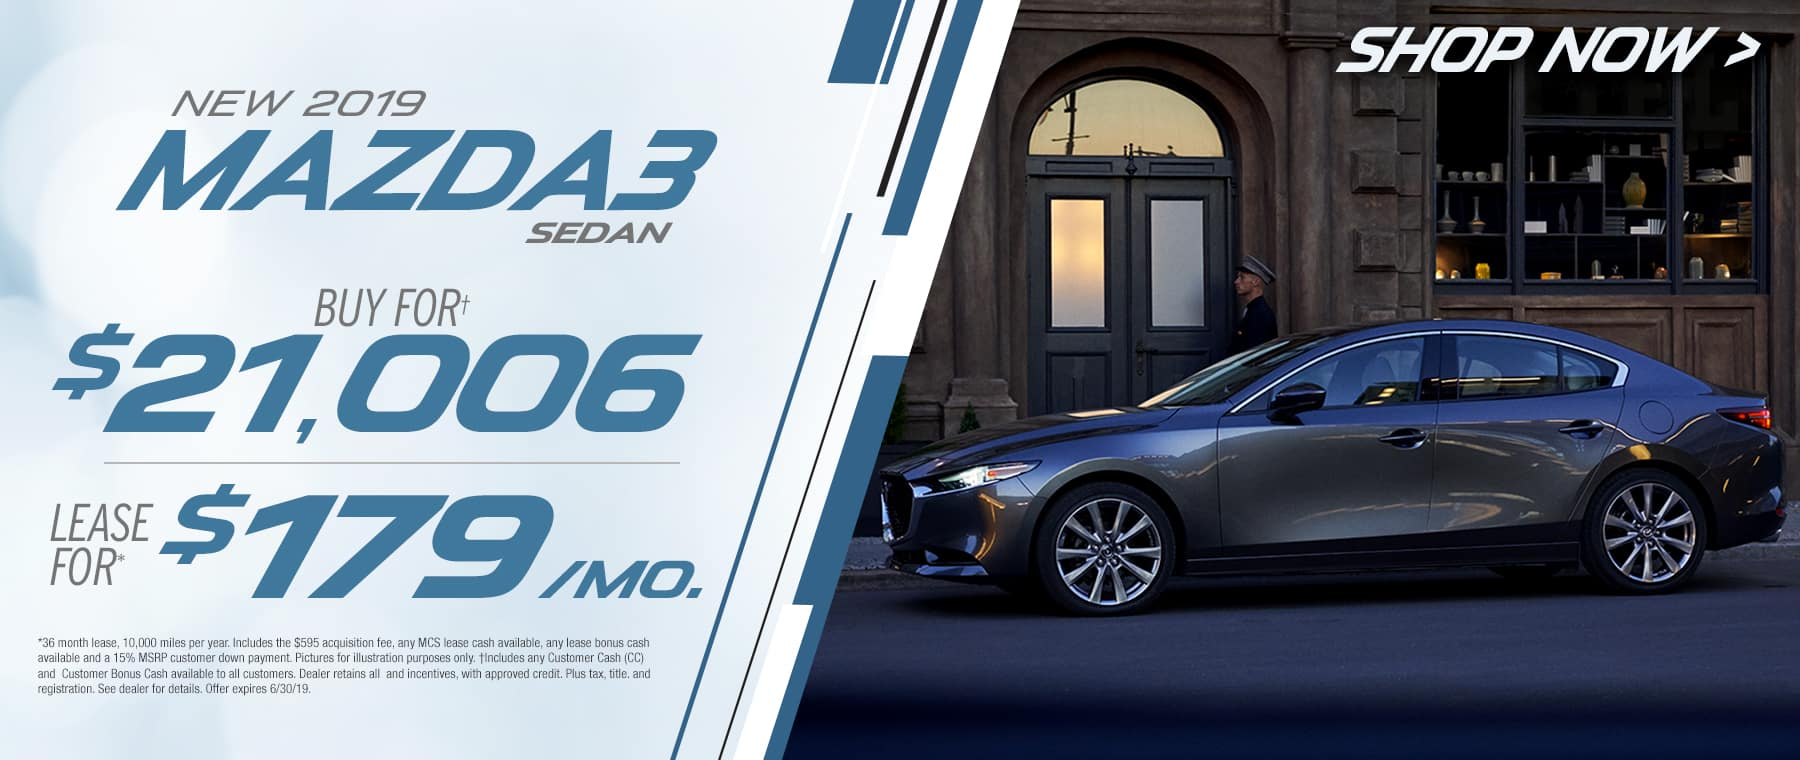 2019 Mazda3 Sedan$179 Per Month OR Buy For $21006